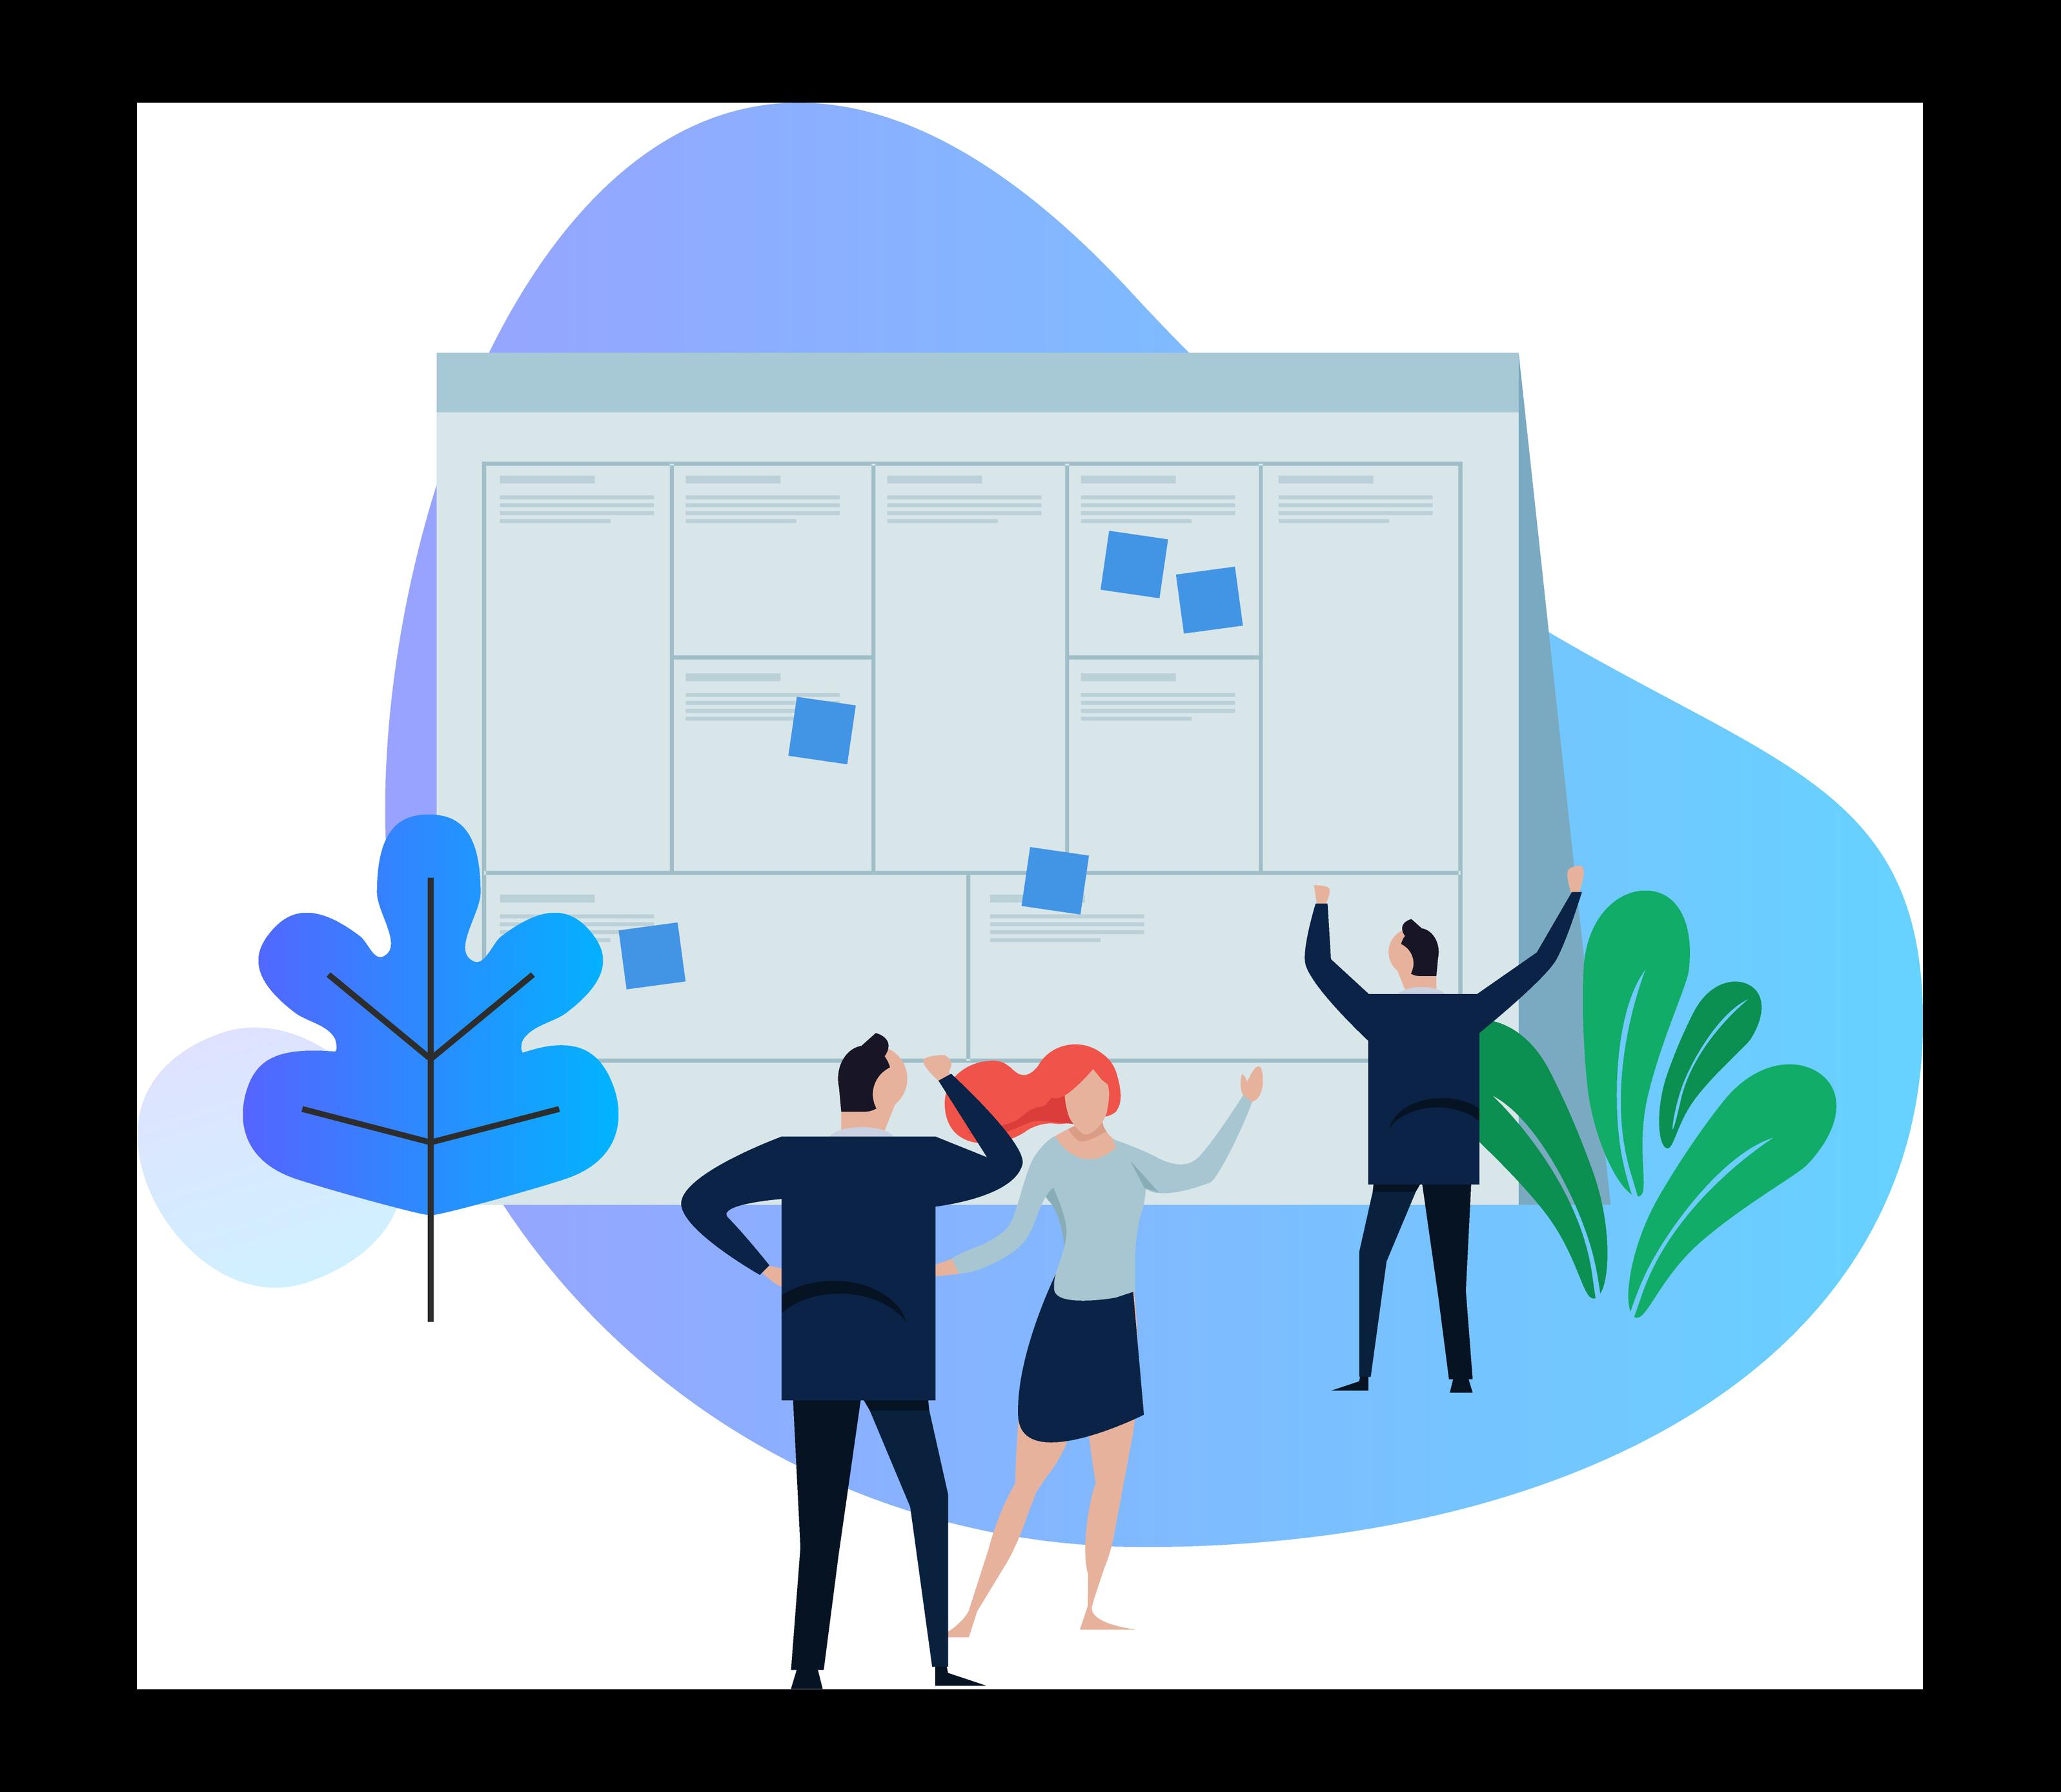 Business canvas illustration